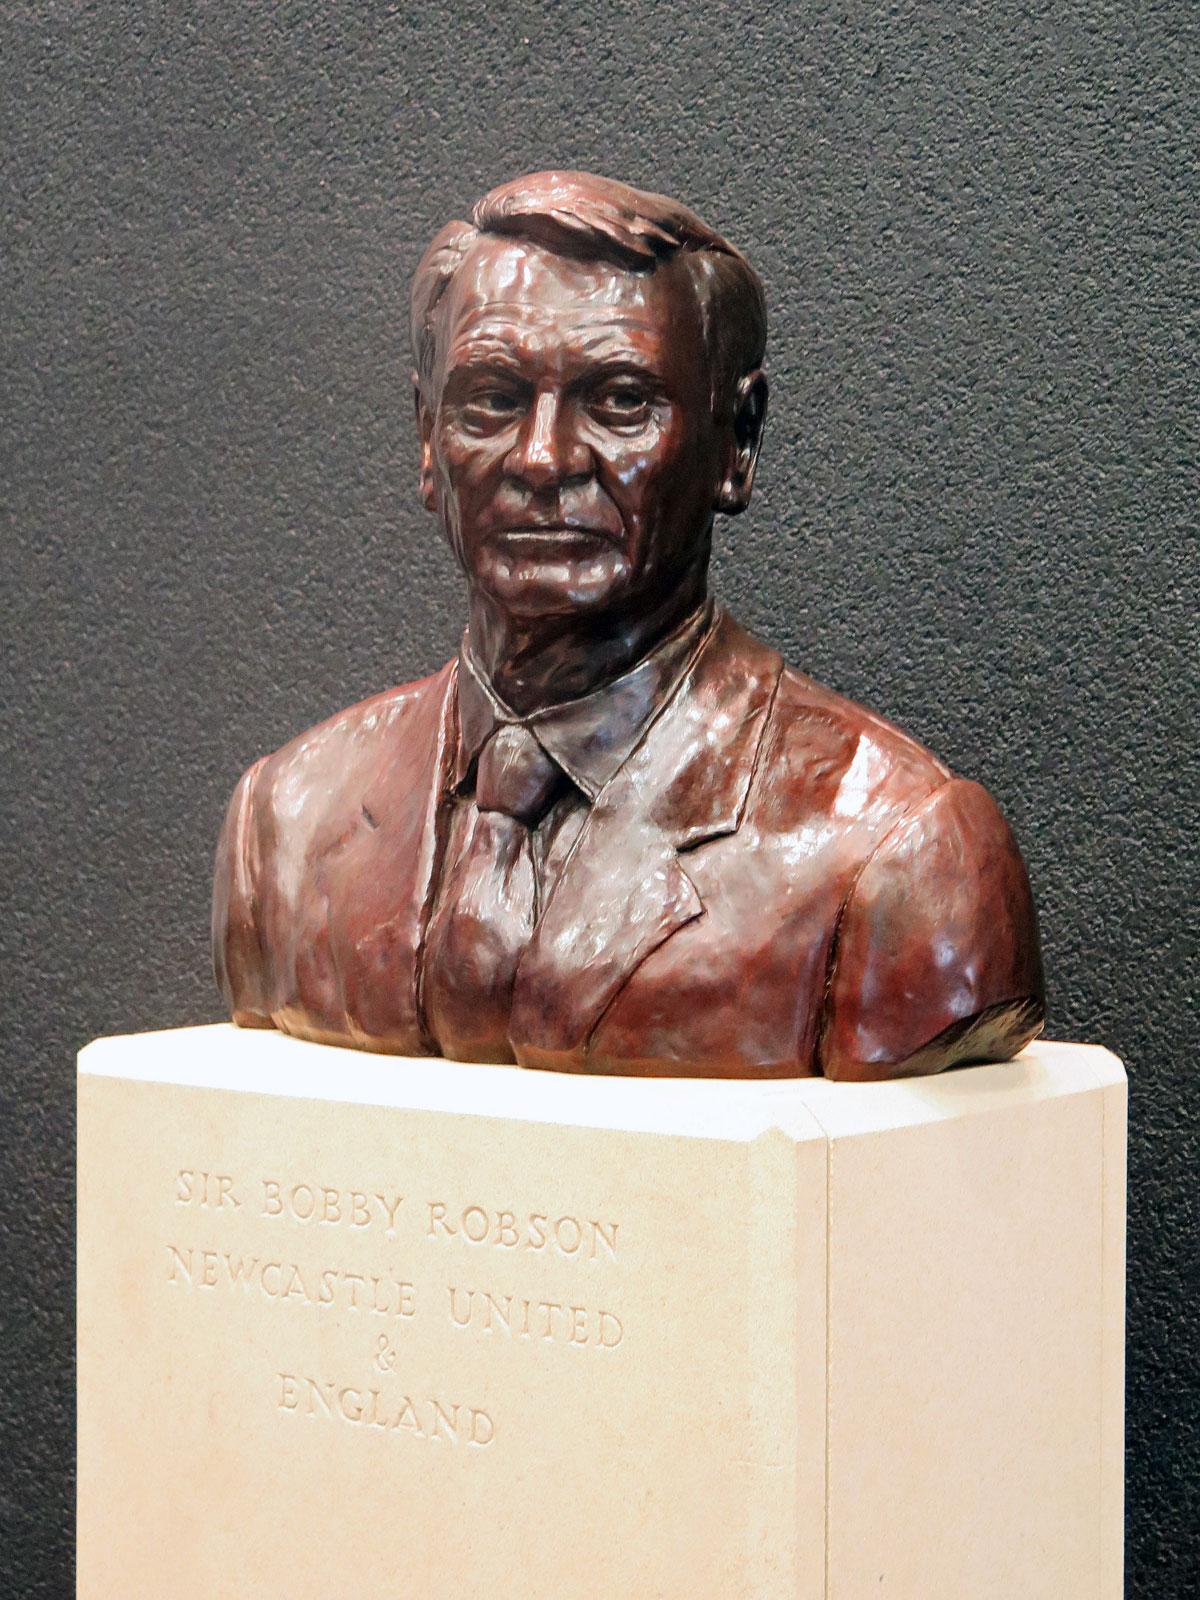 Bust of Sir Bobby Robson